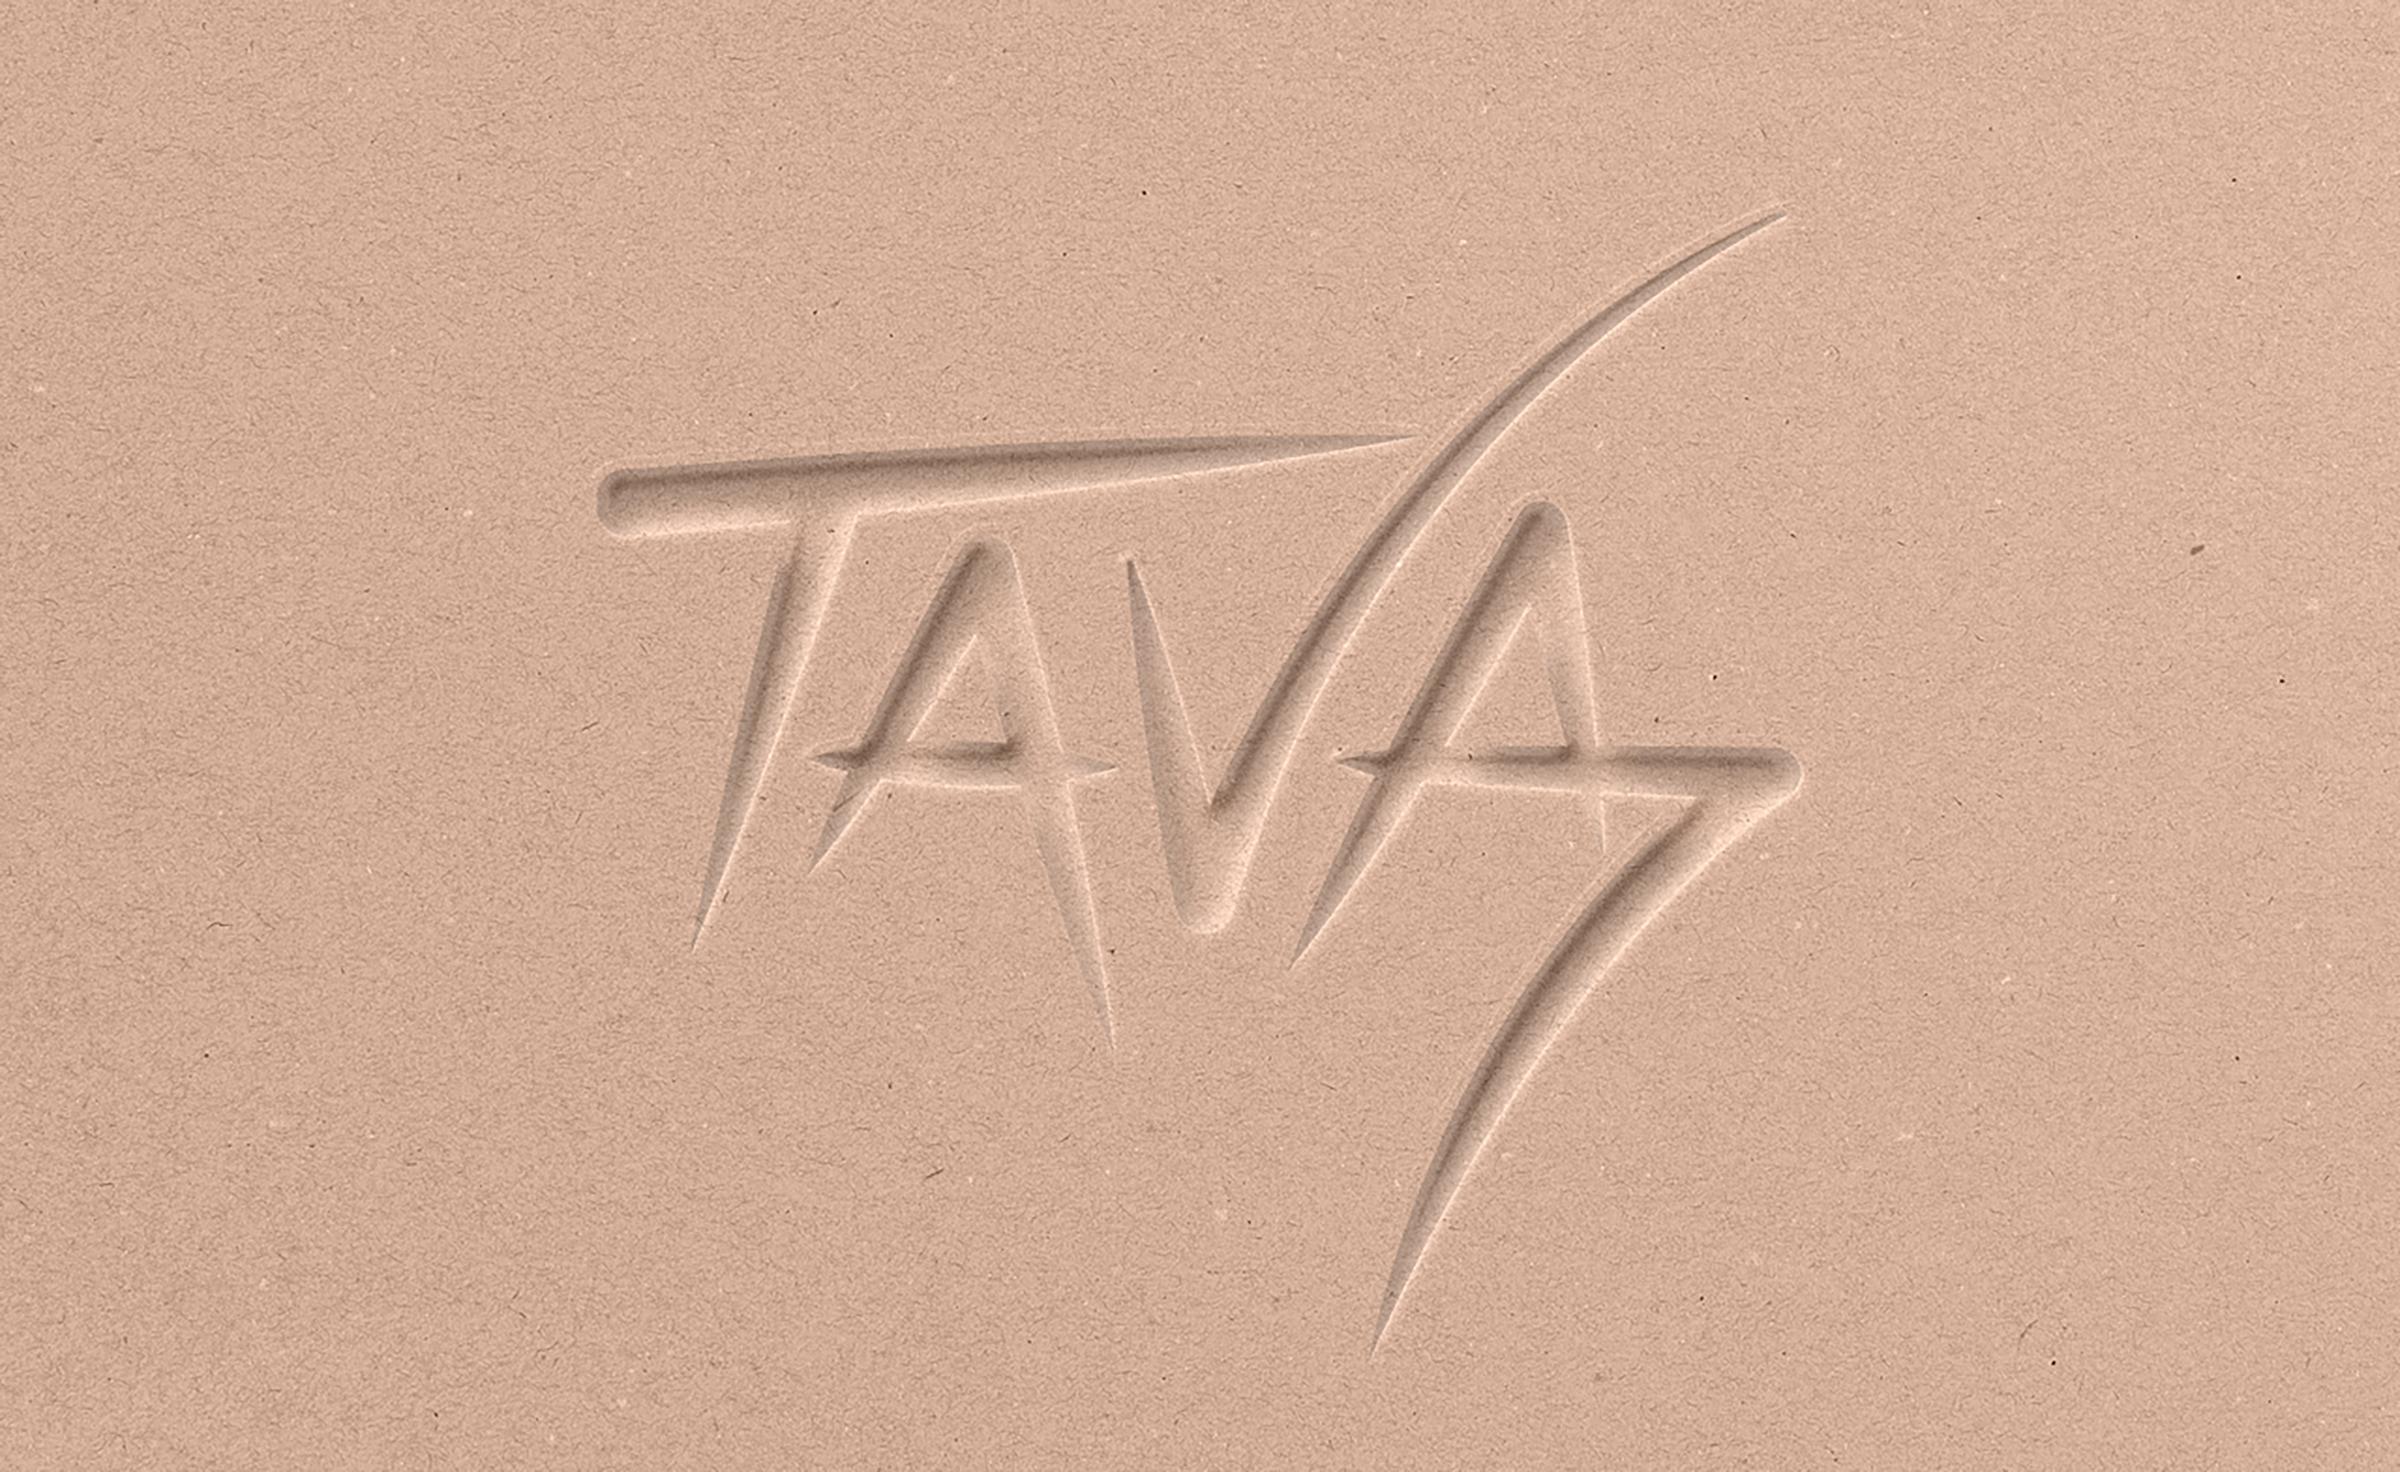 restyling sito web tava